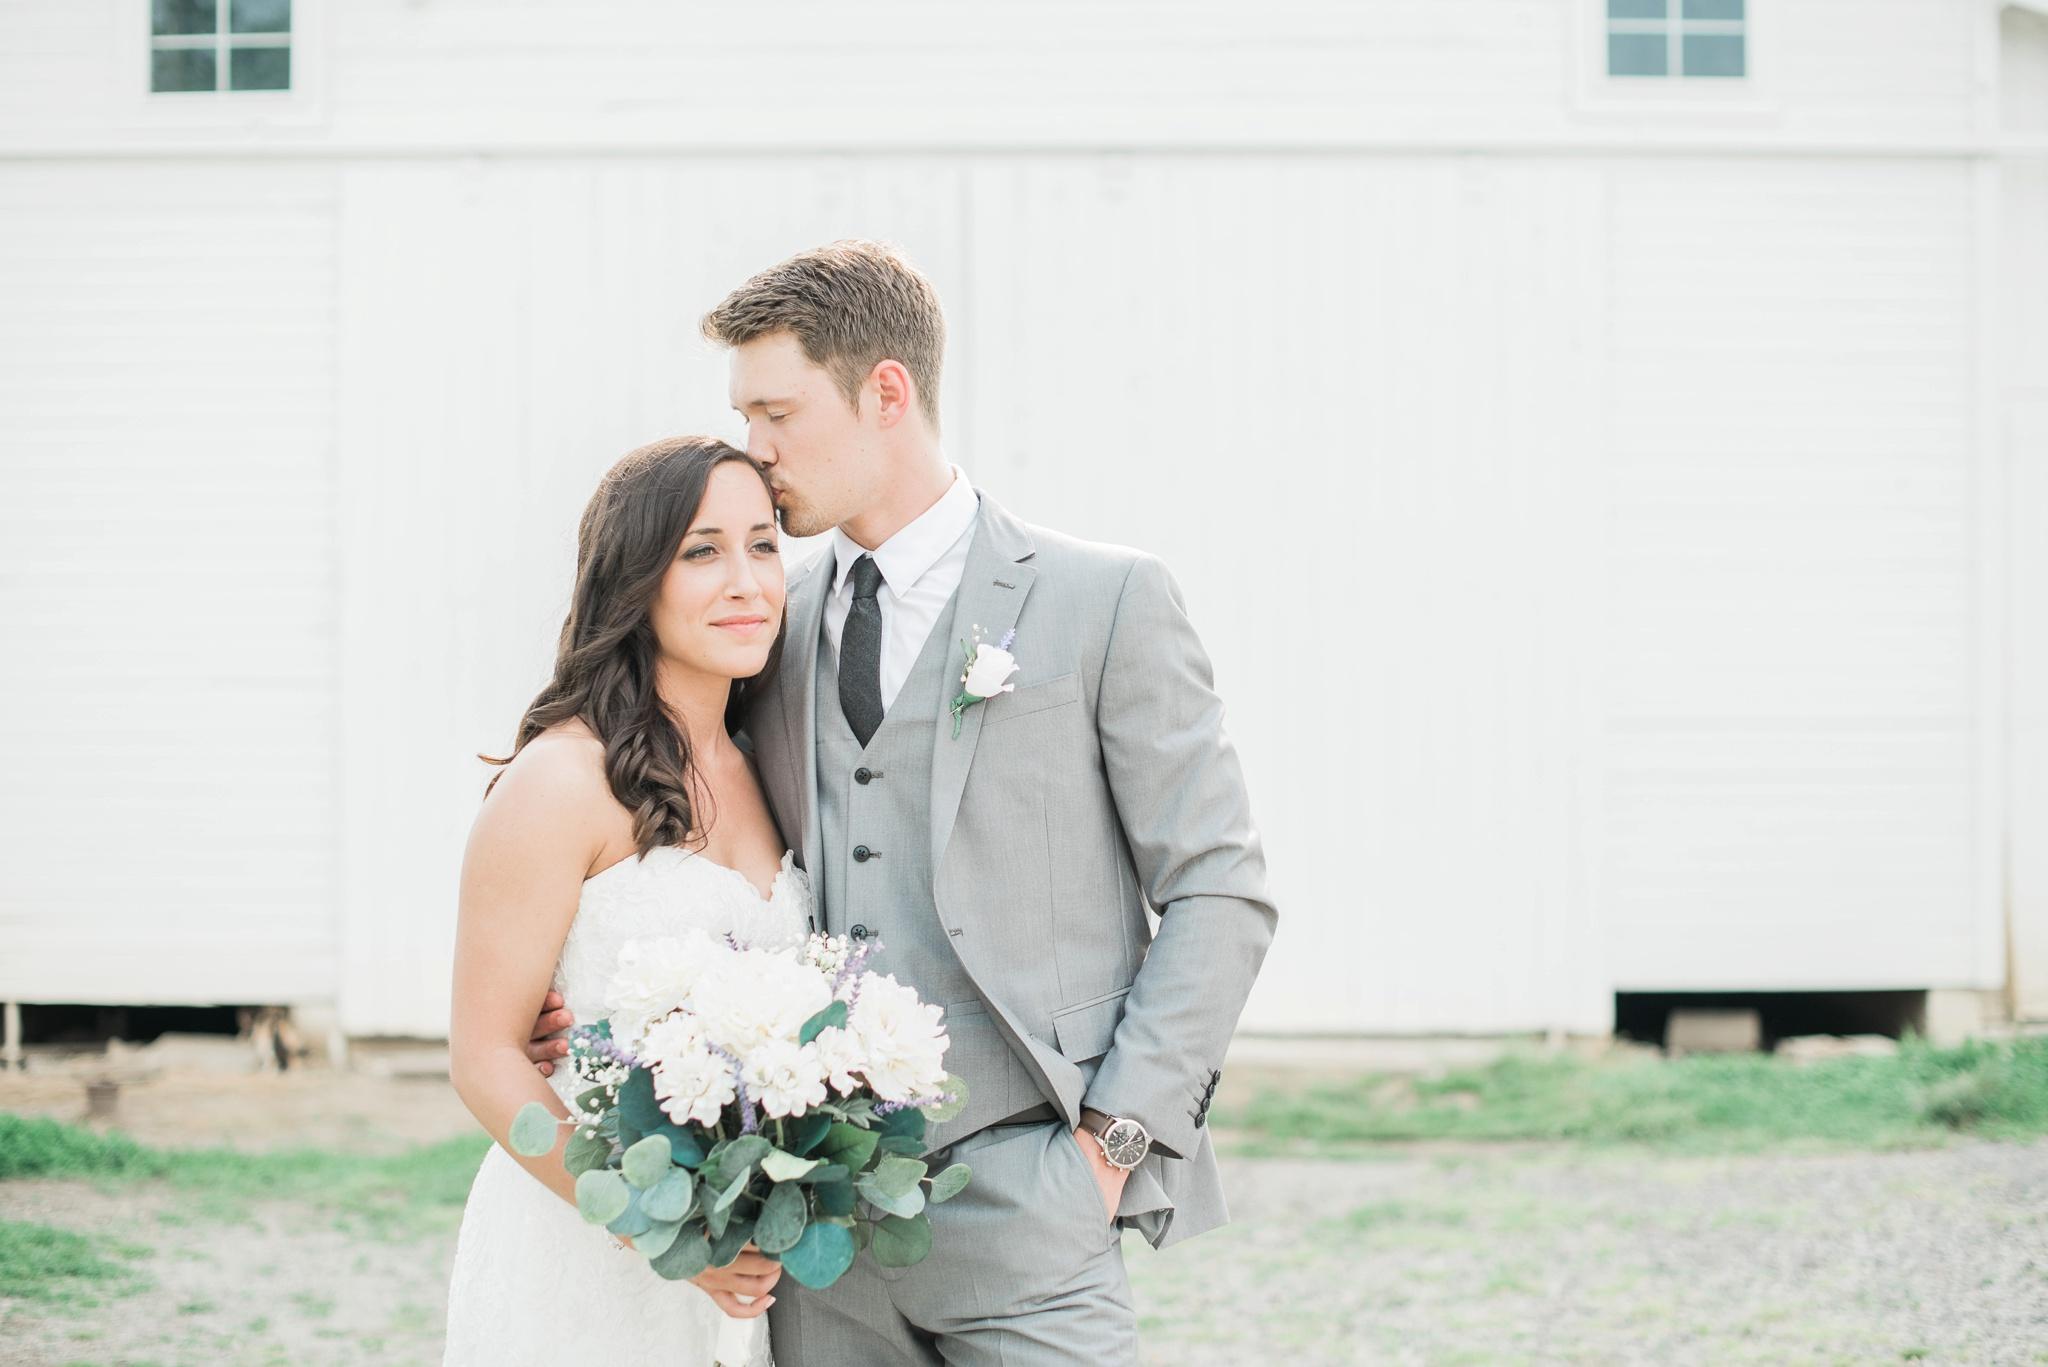 niederman-farm-wedding-cincinnati-ohio-photographer_0073.jpg